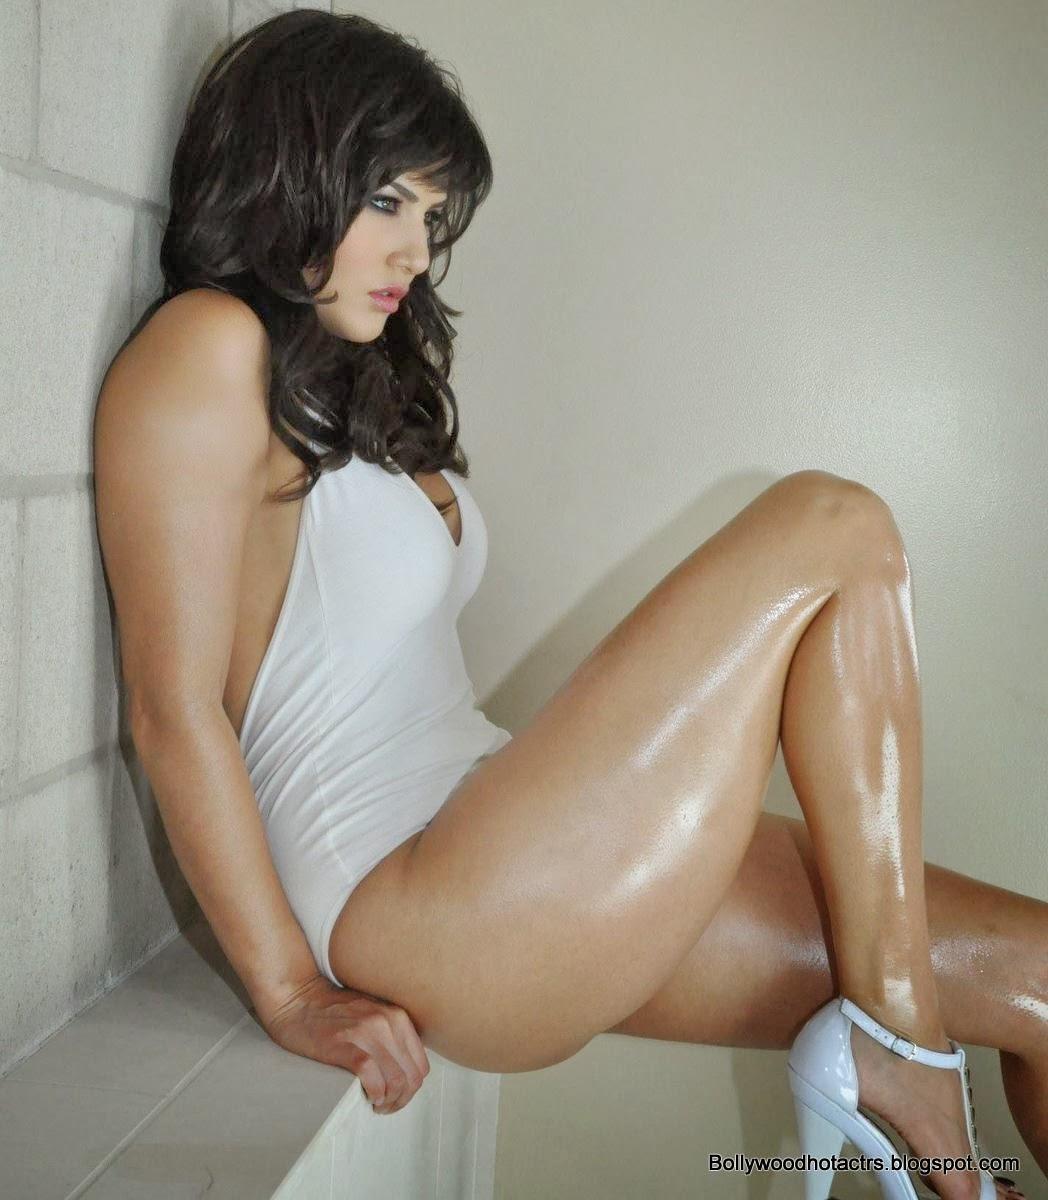 Sunny Leone HOT Bikini Show Wallpapers